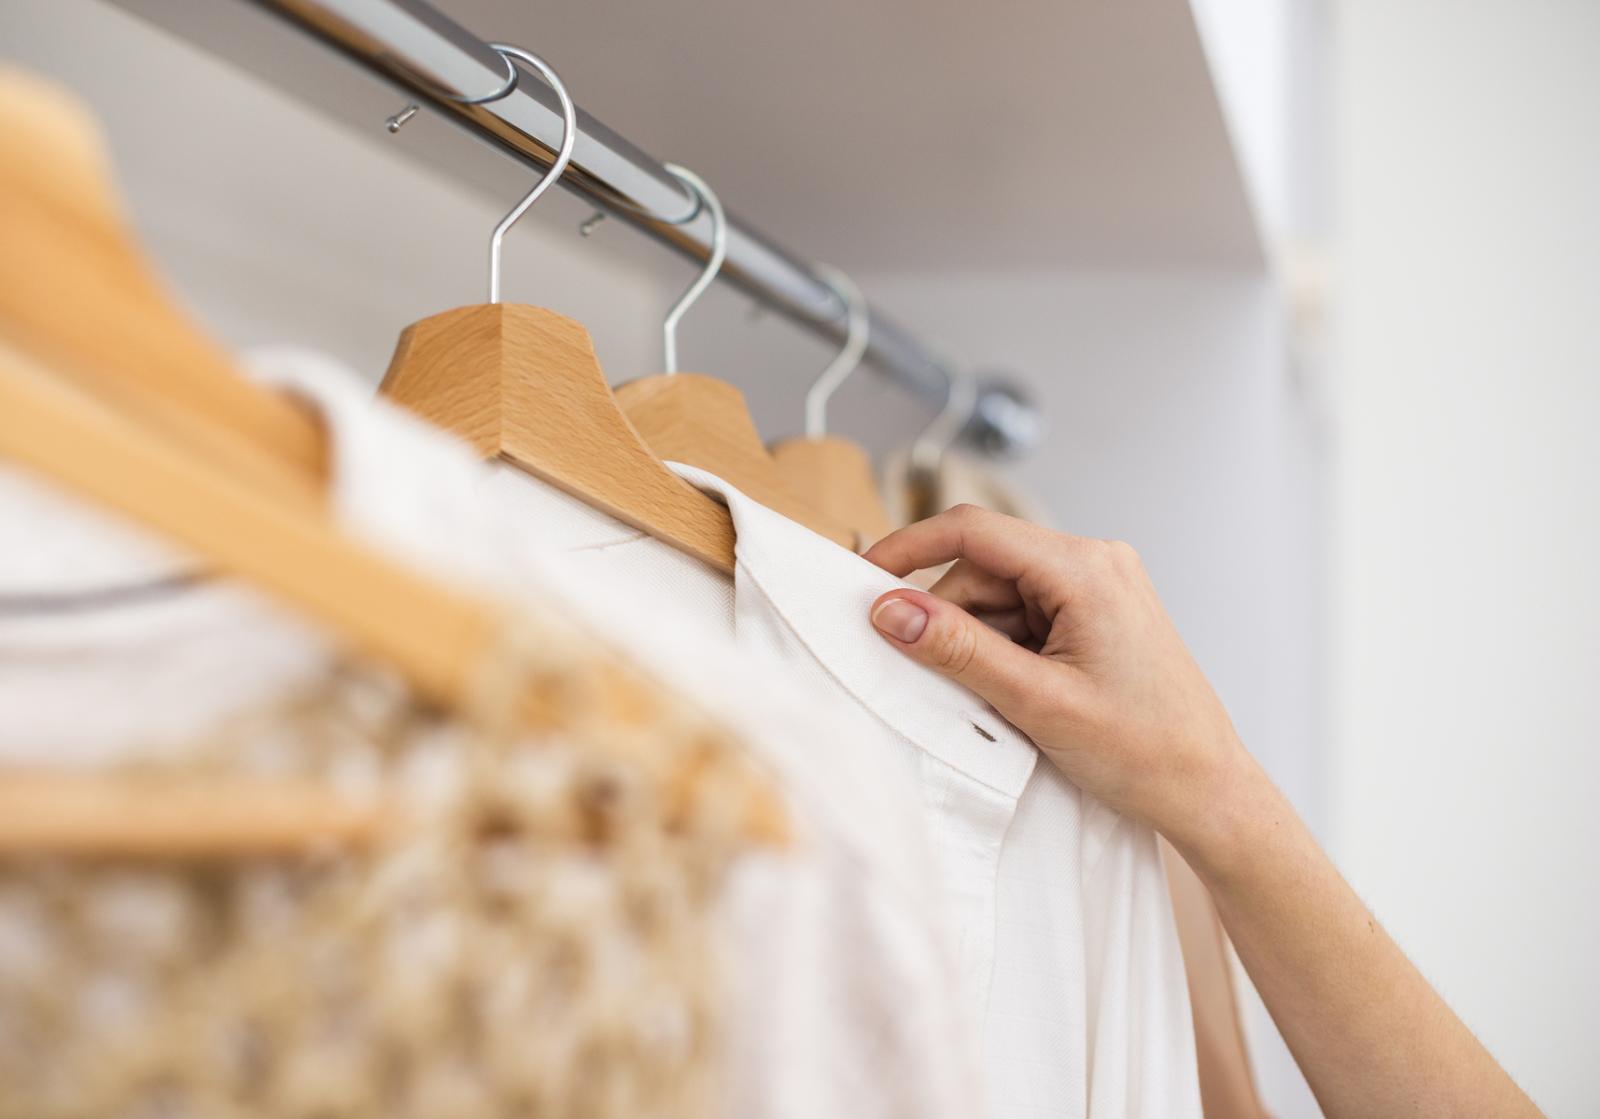 hanging delicate fabrics inside a closet